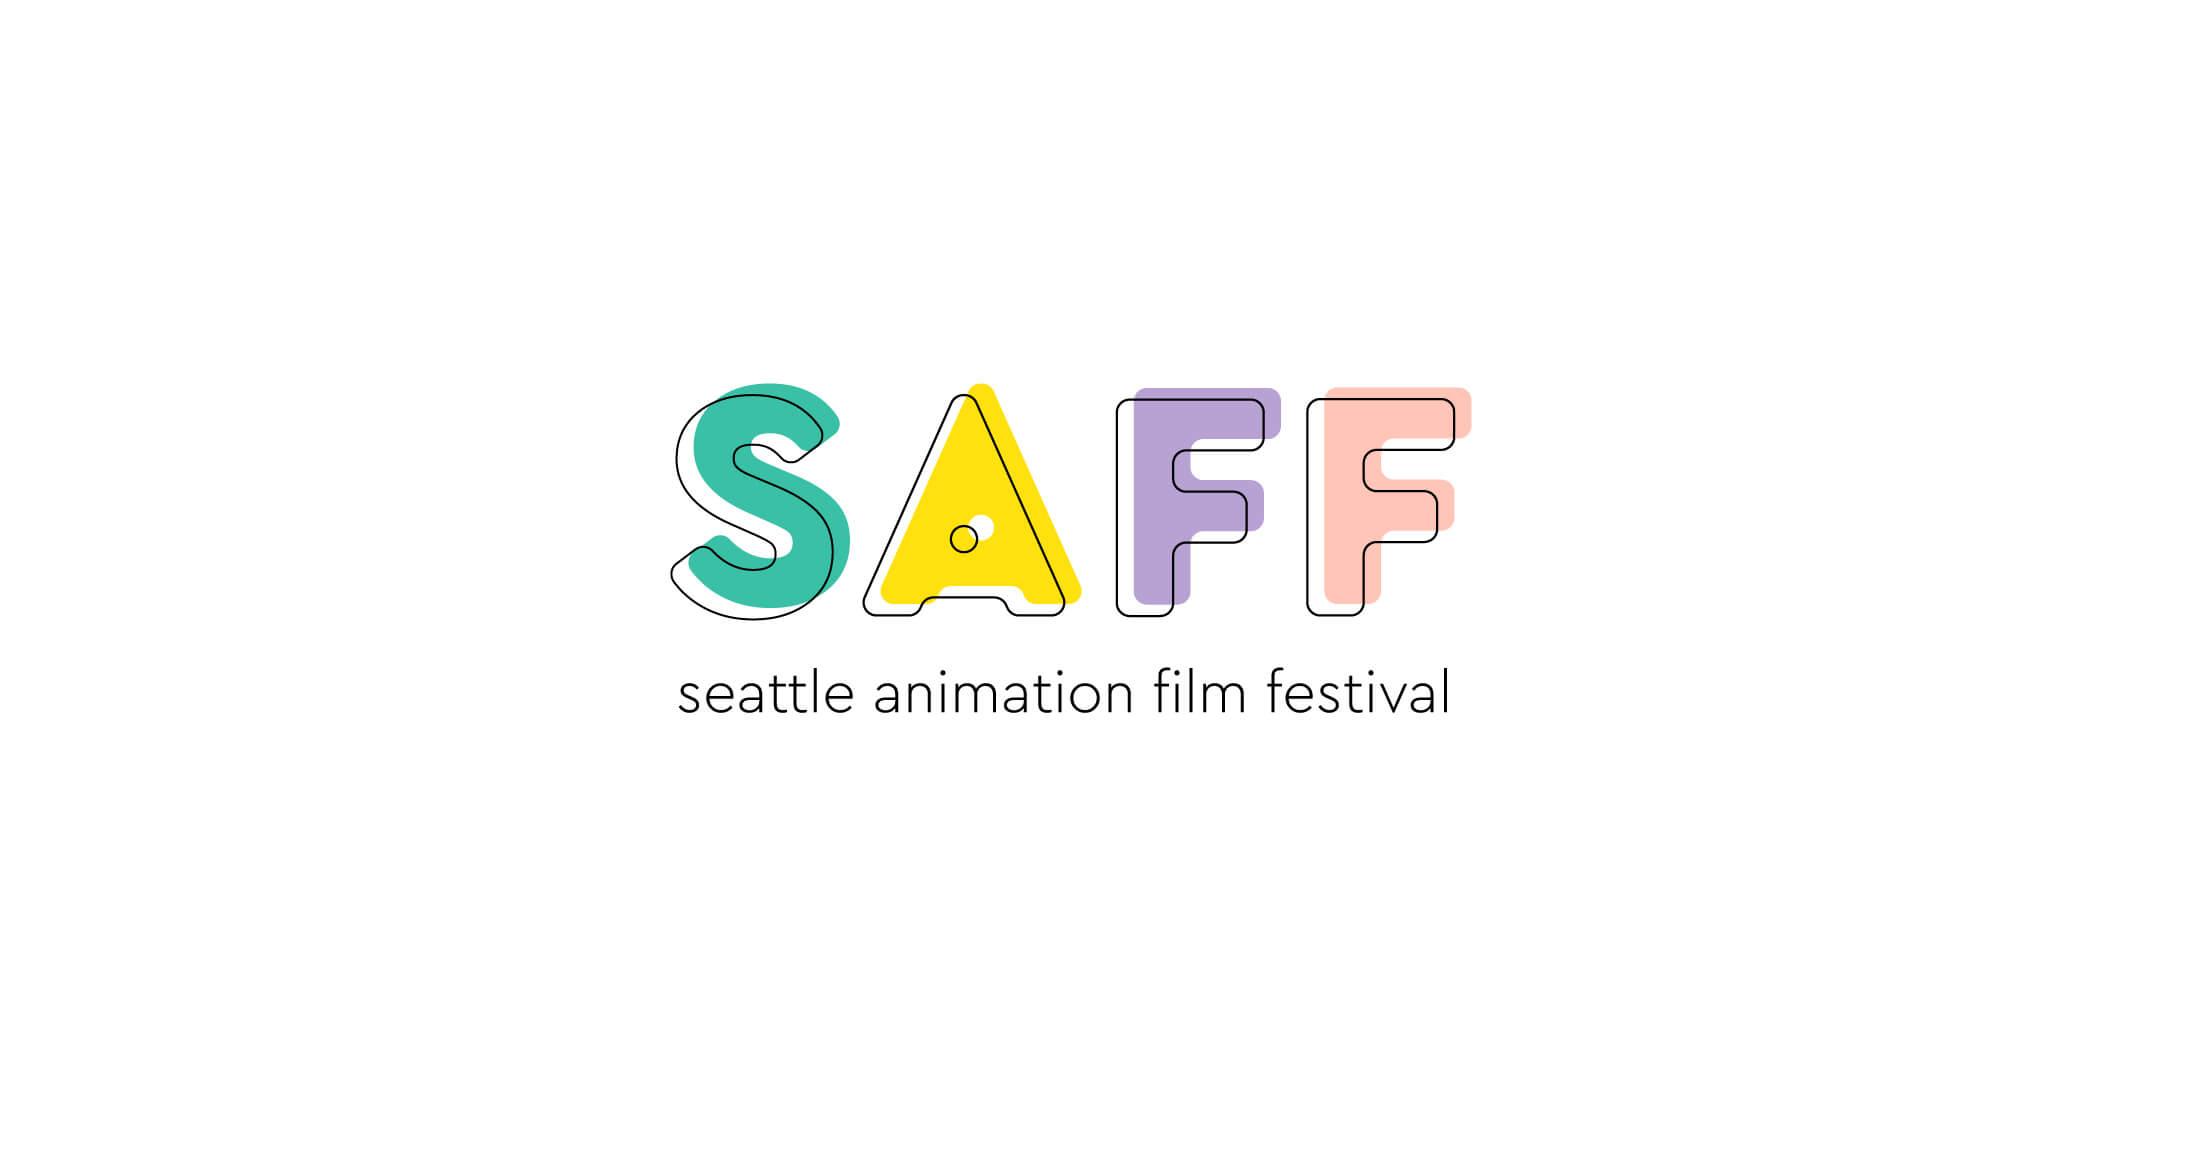 Seattle Animation Film Festival